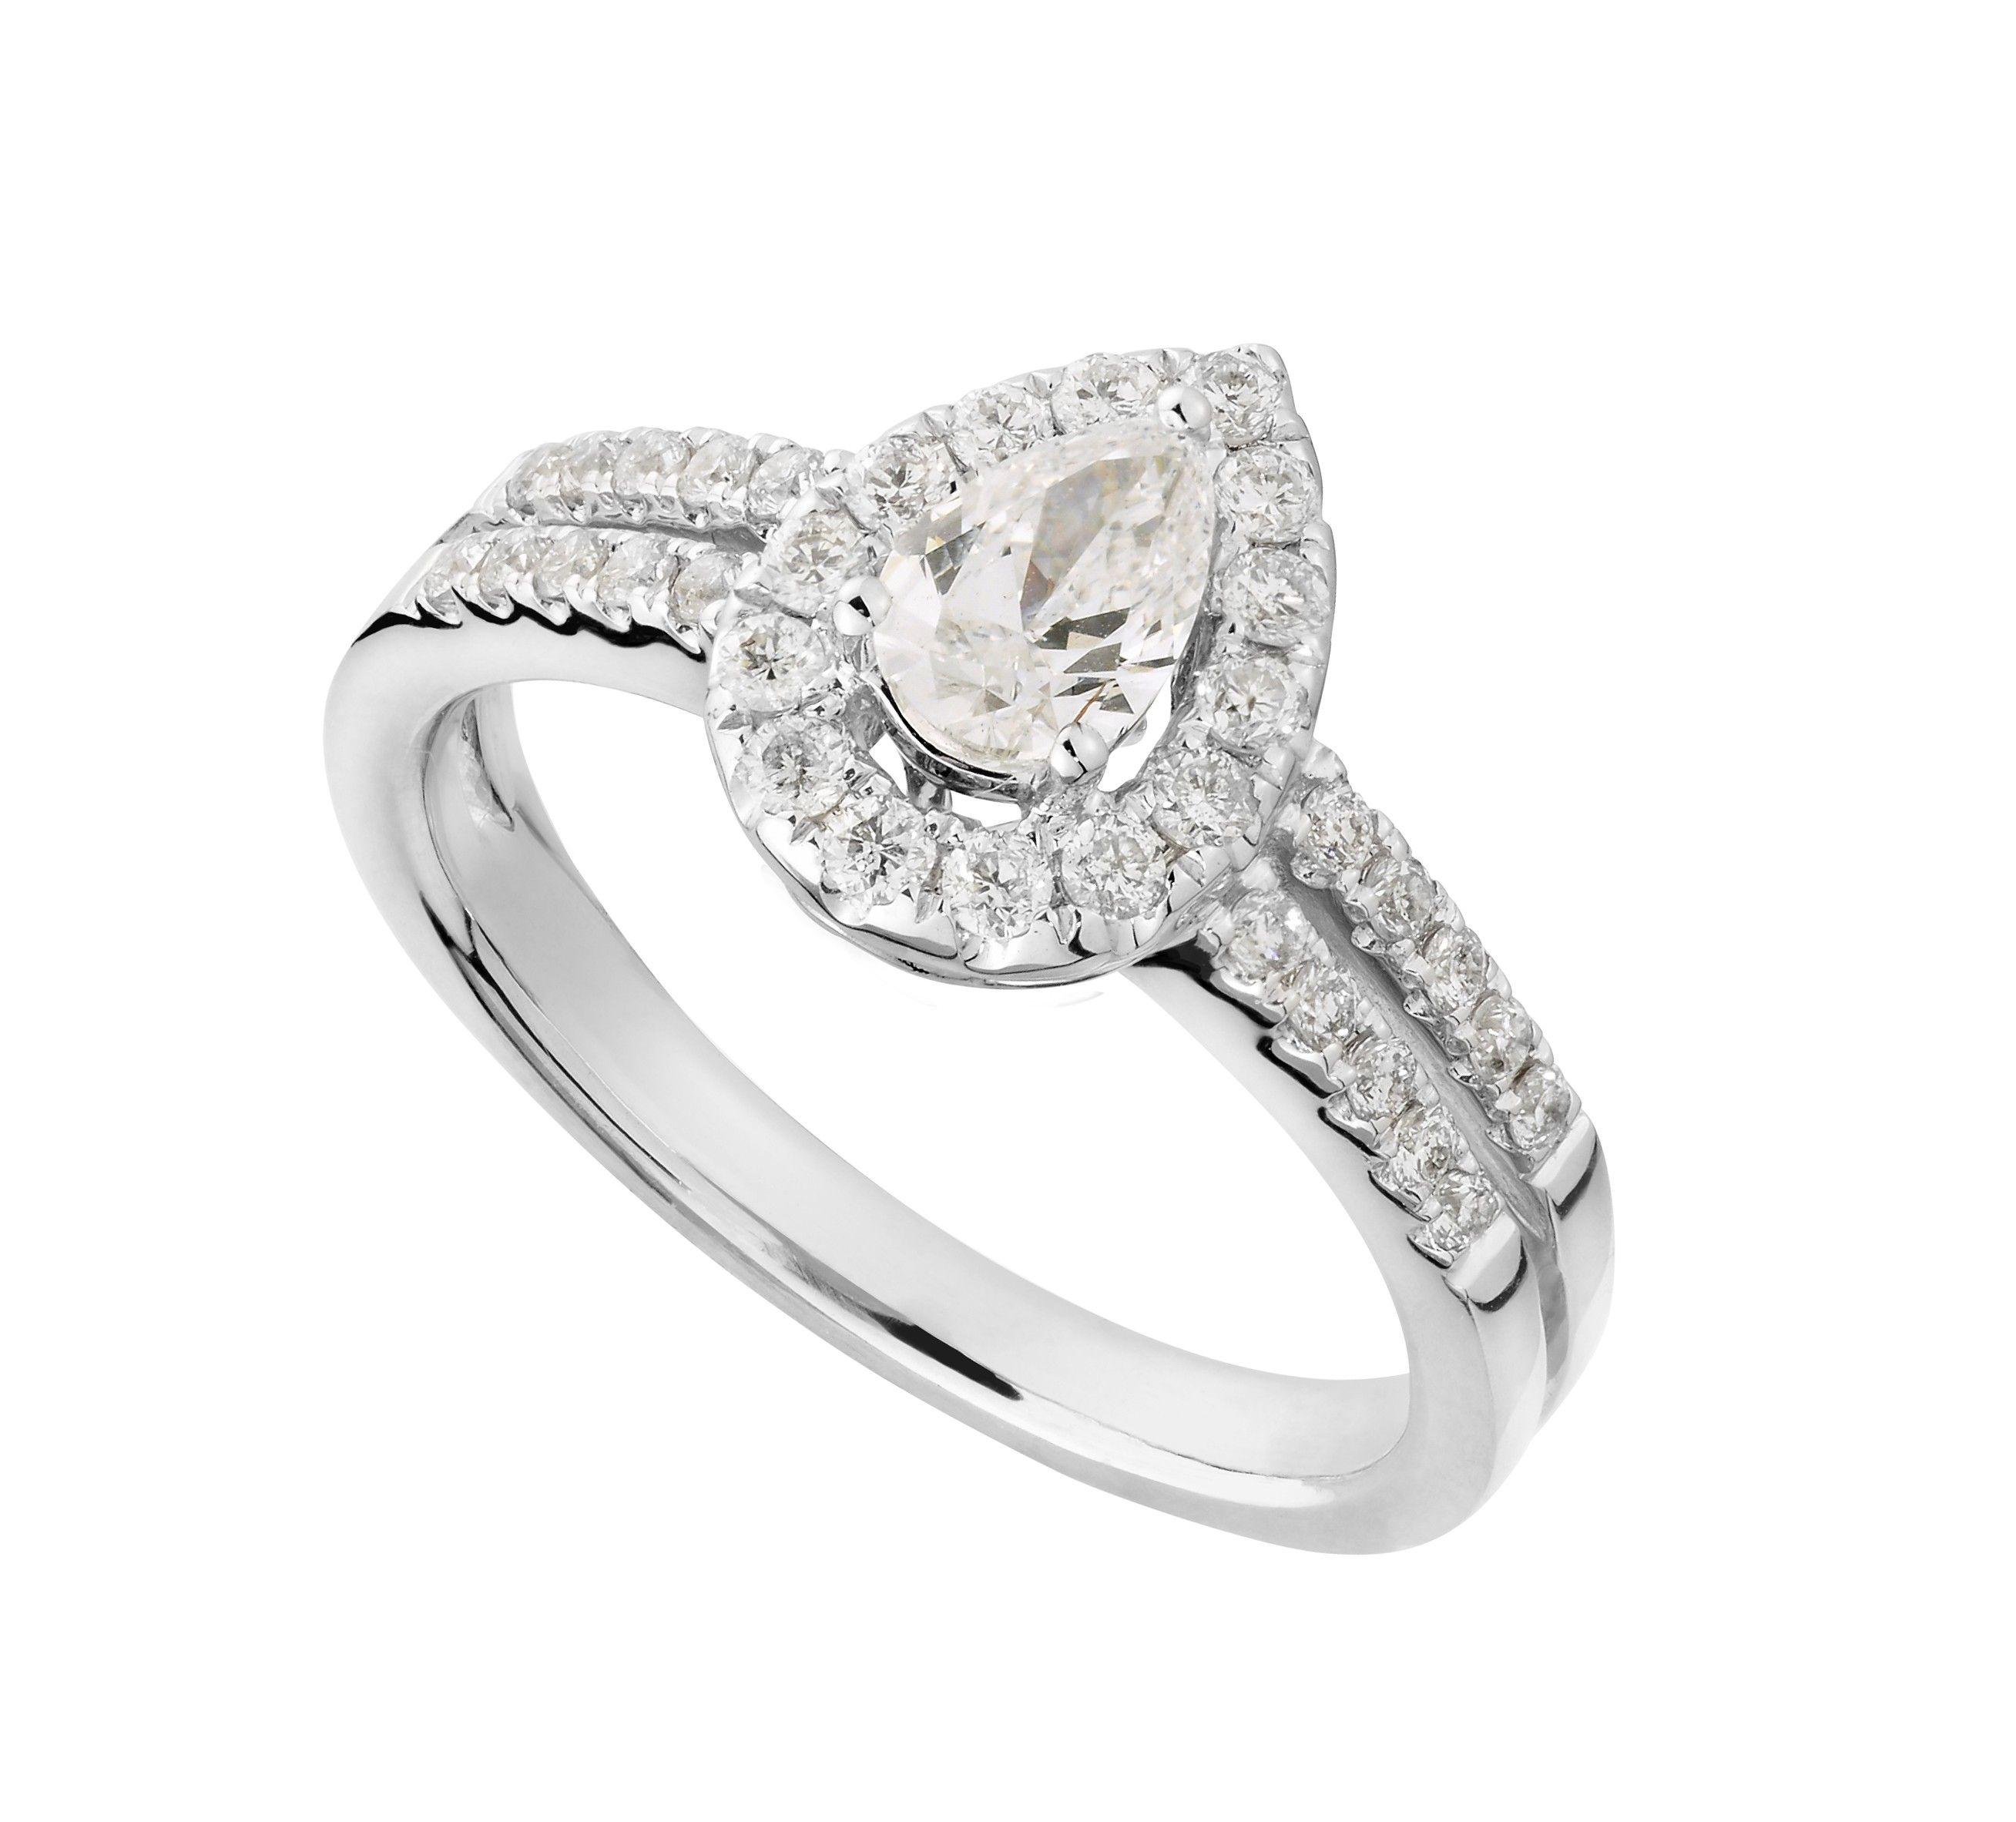 18ct White Gold 080 Carat Pear Cut Diamond Ring